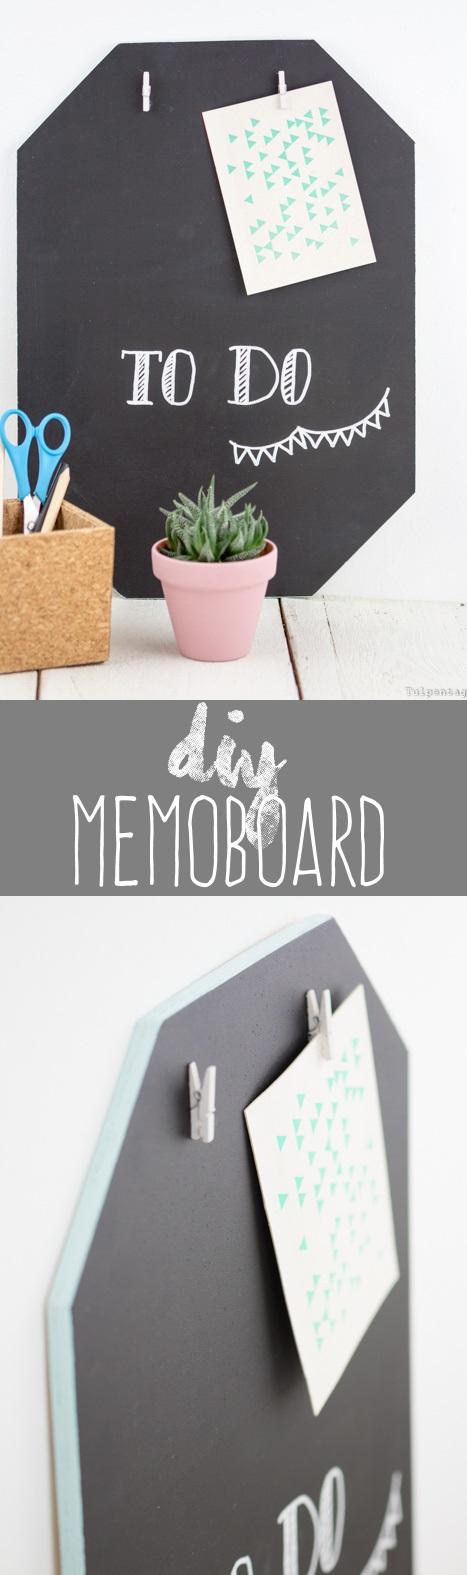 diy memoboard mit tafellack decor deko pinterest. Black Bedroom Furniture Sets. Home Design Ideas